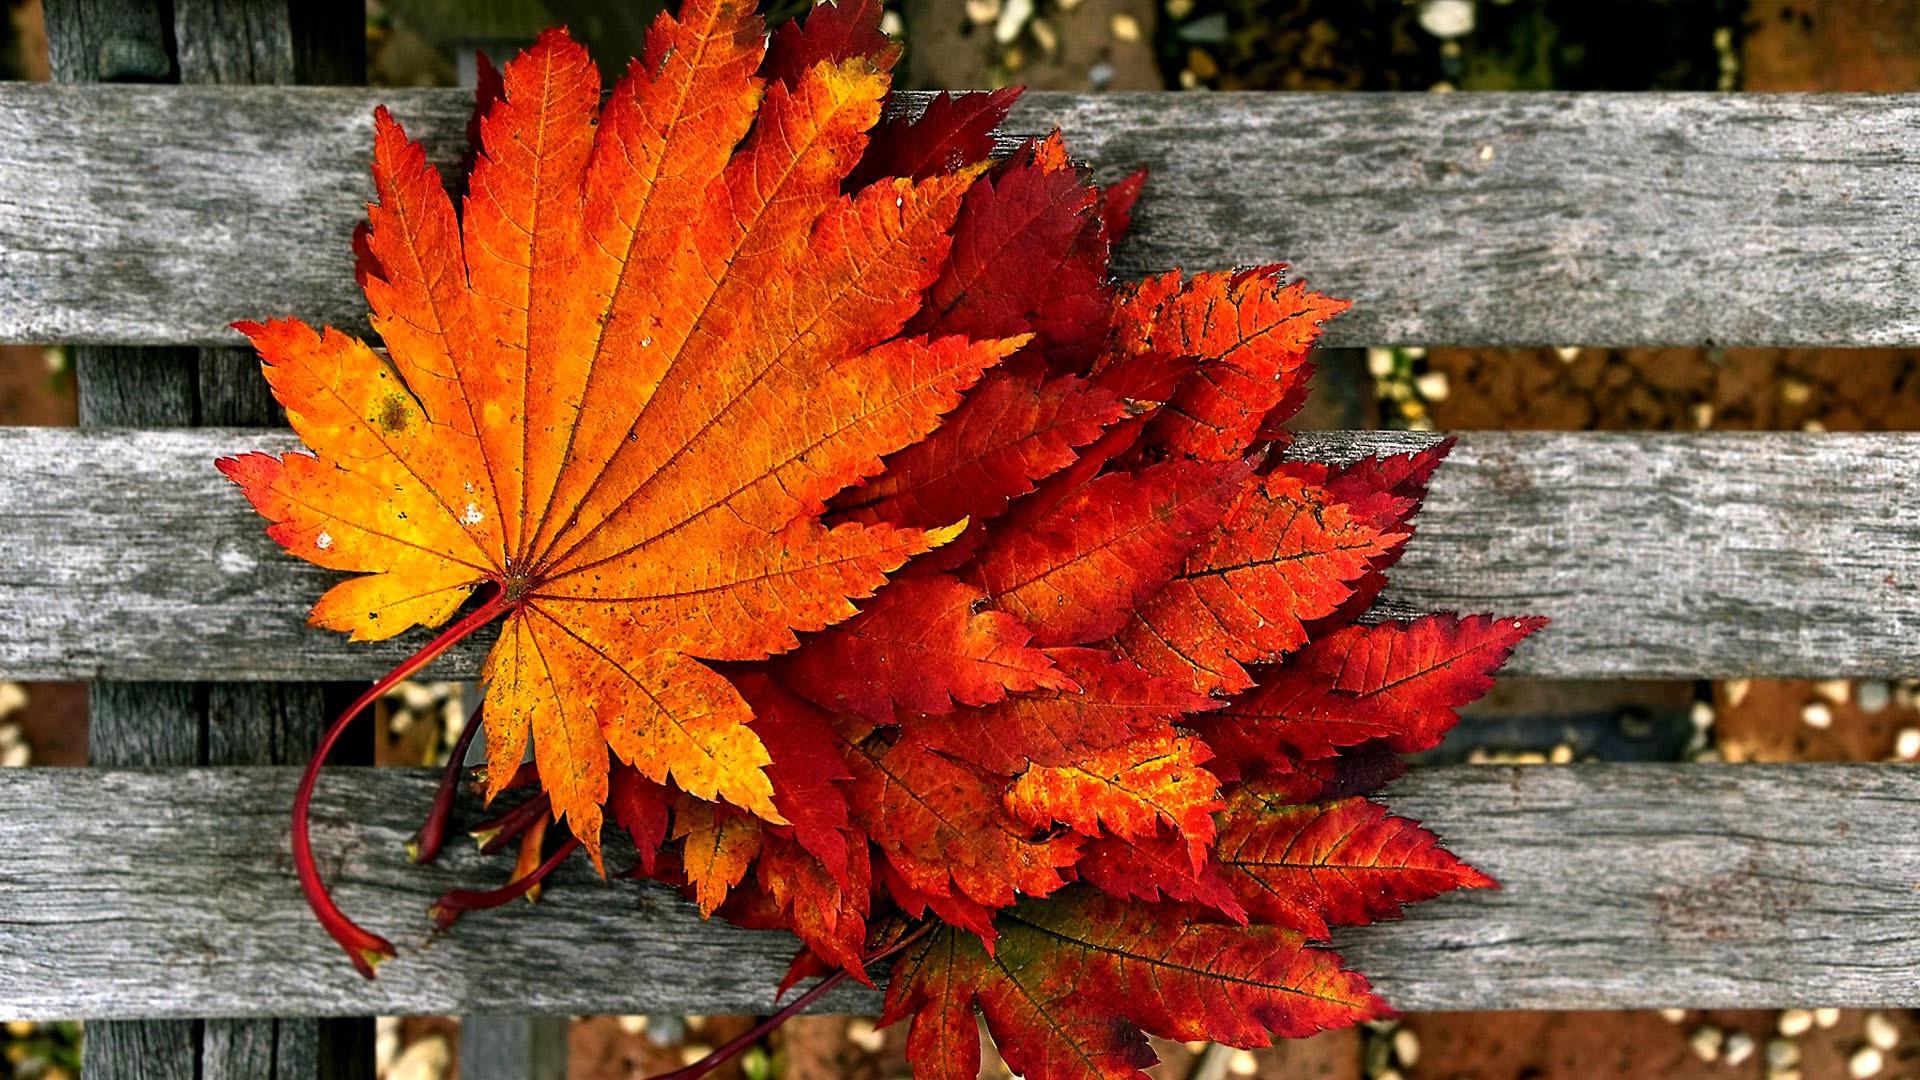 Autumn wallpaper HD free download.